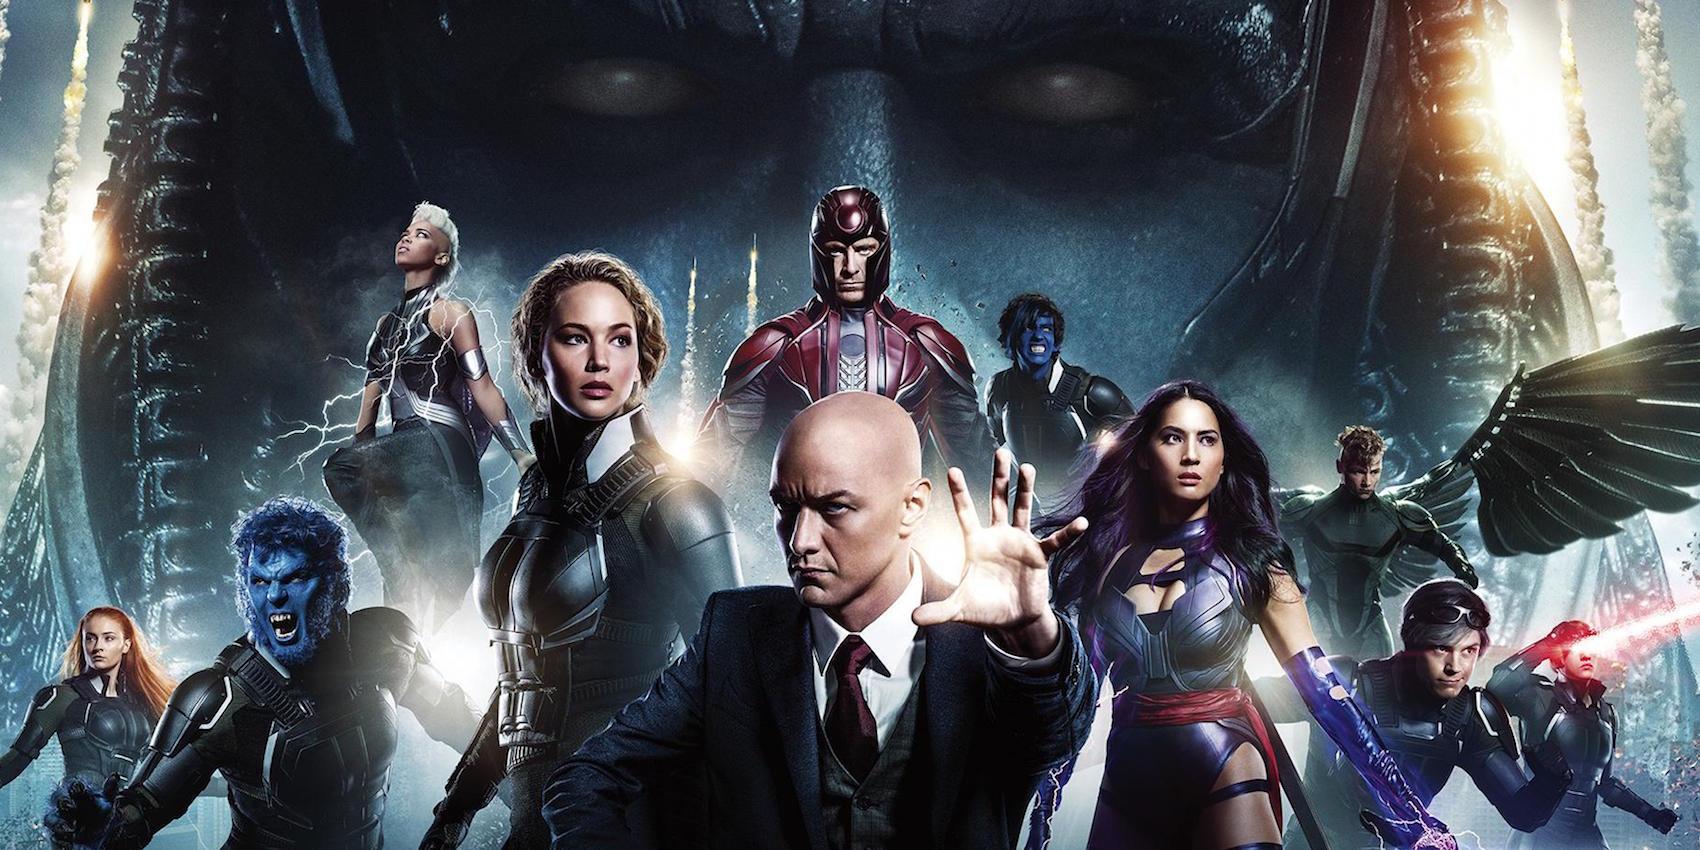 x men apocalypse movie cast 2016 Who Won? Ranking the Comic Book Movies of 2016